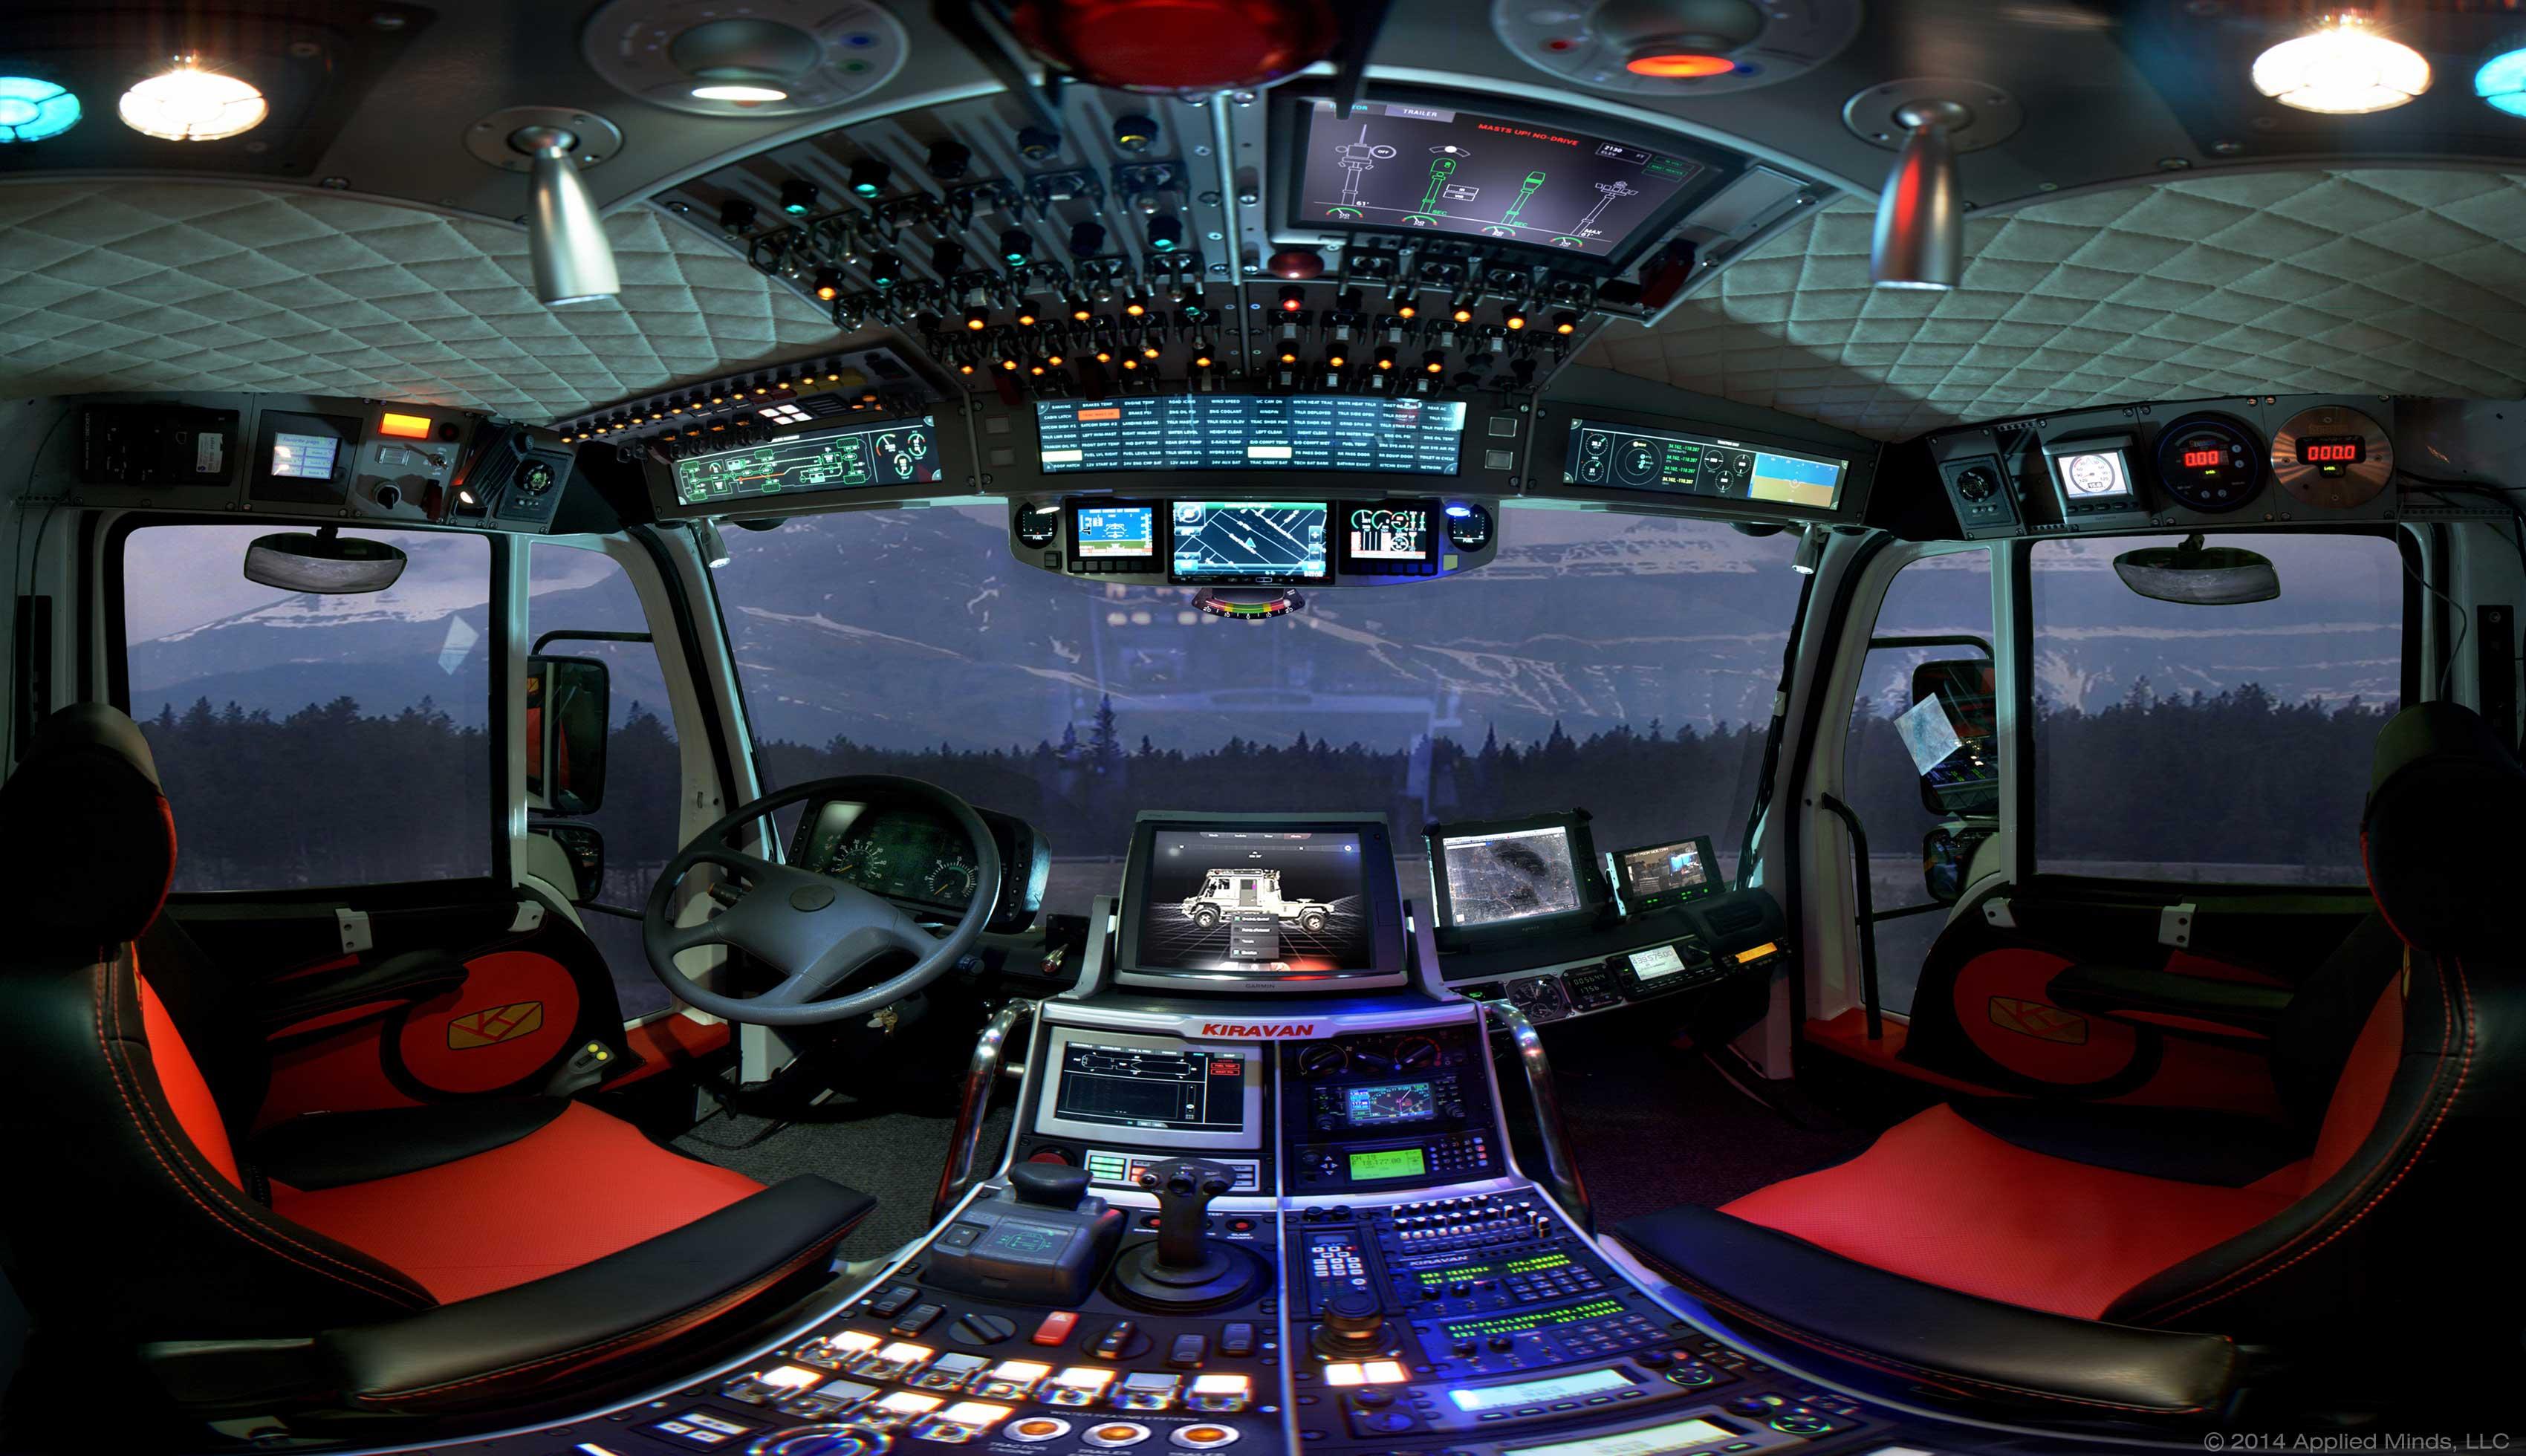 The cockpit interior